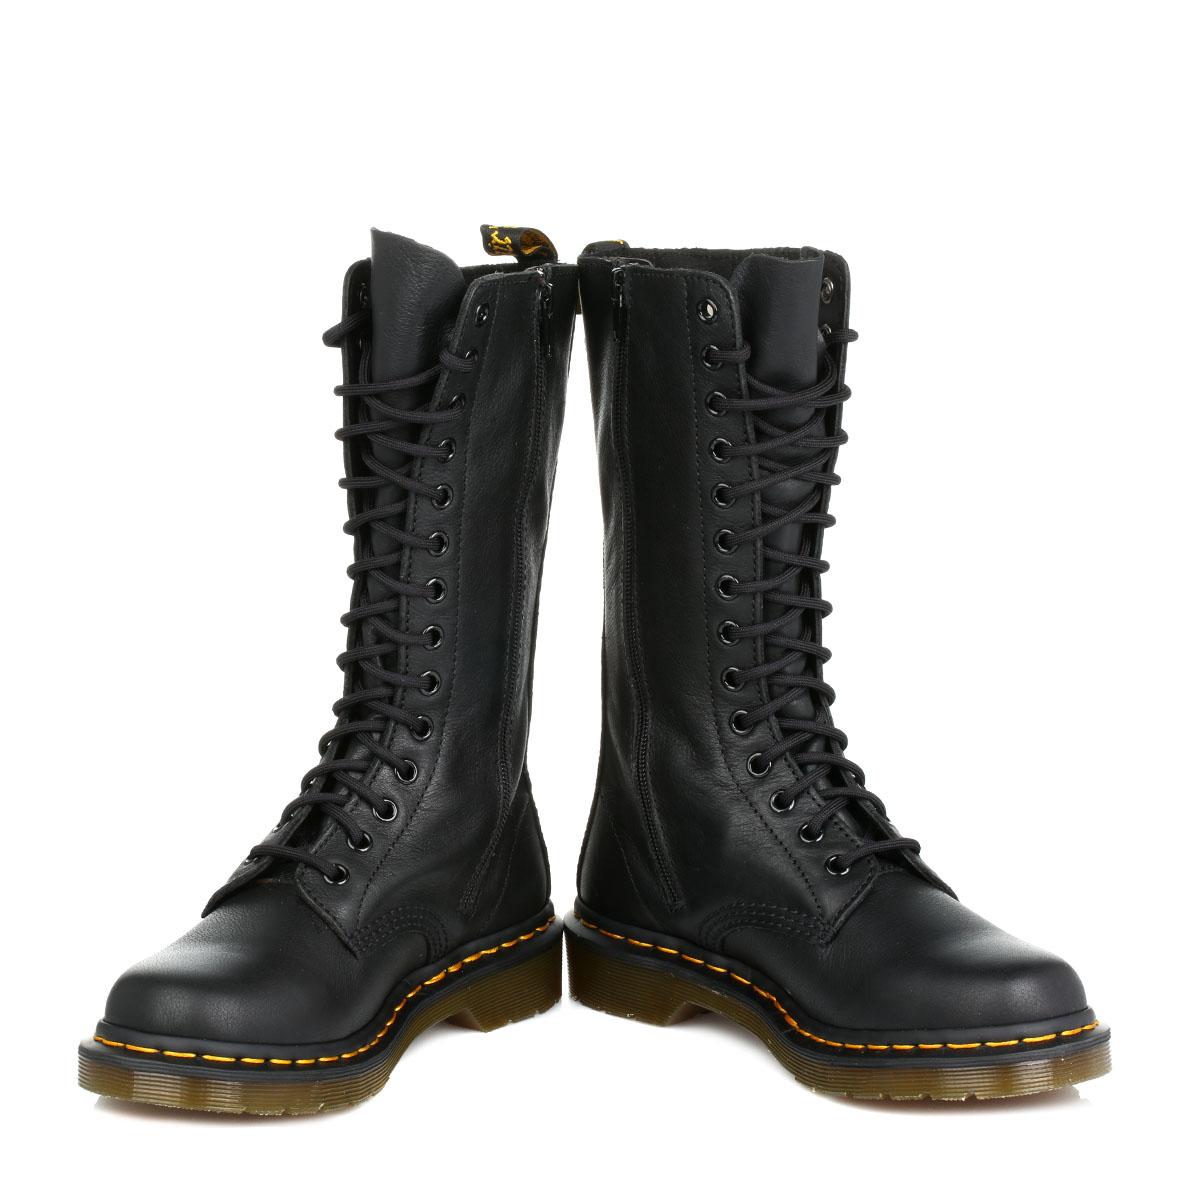 Dr Martens Womens Shoes